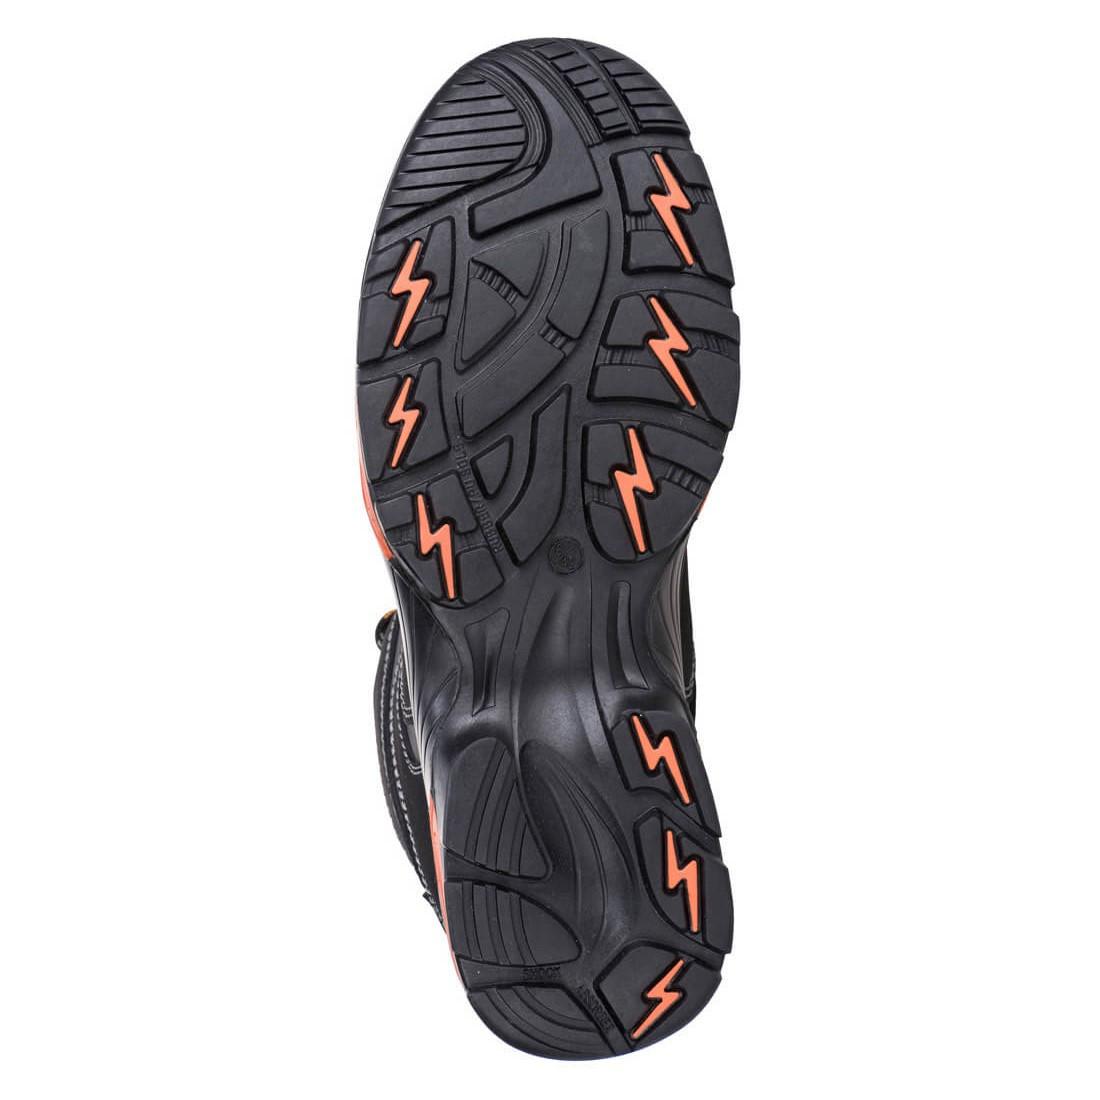 Pantof Compositelite™ Operis S3 HRO - Incaltaminte de protectie